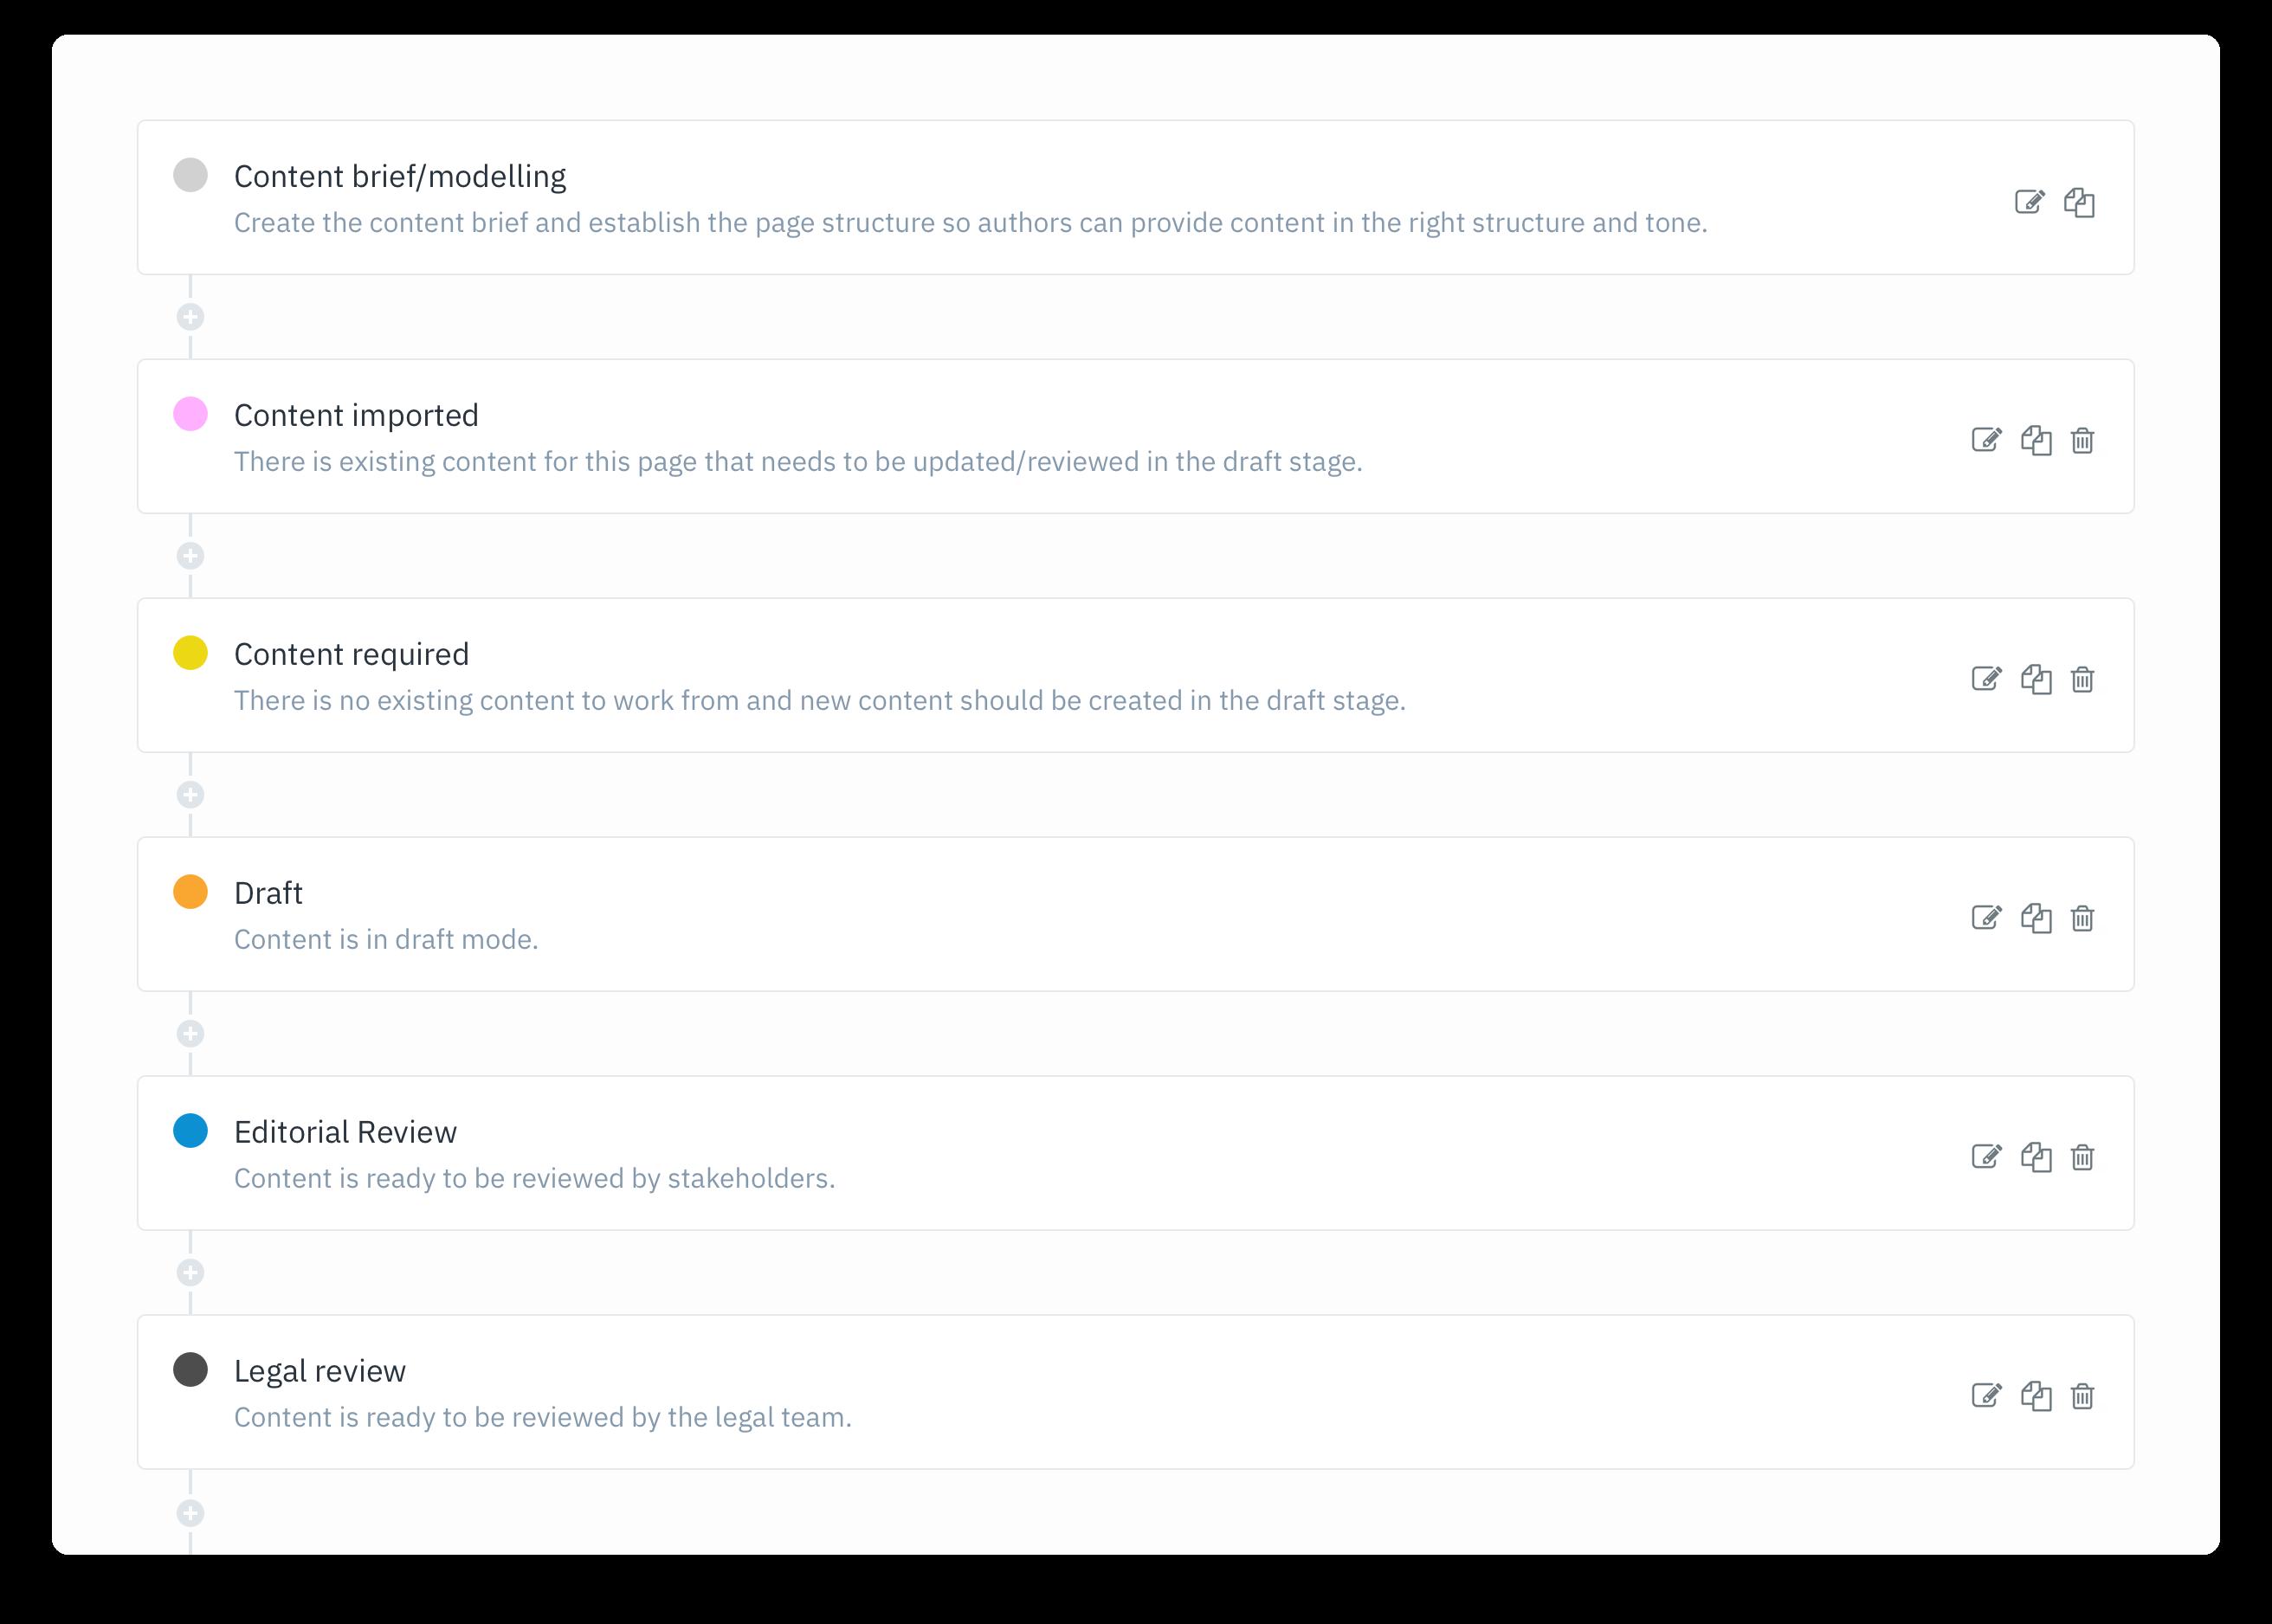 GatherContent Website Redesign Content Workflow